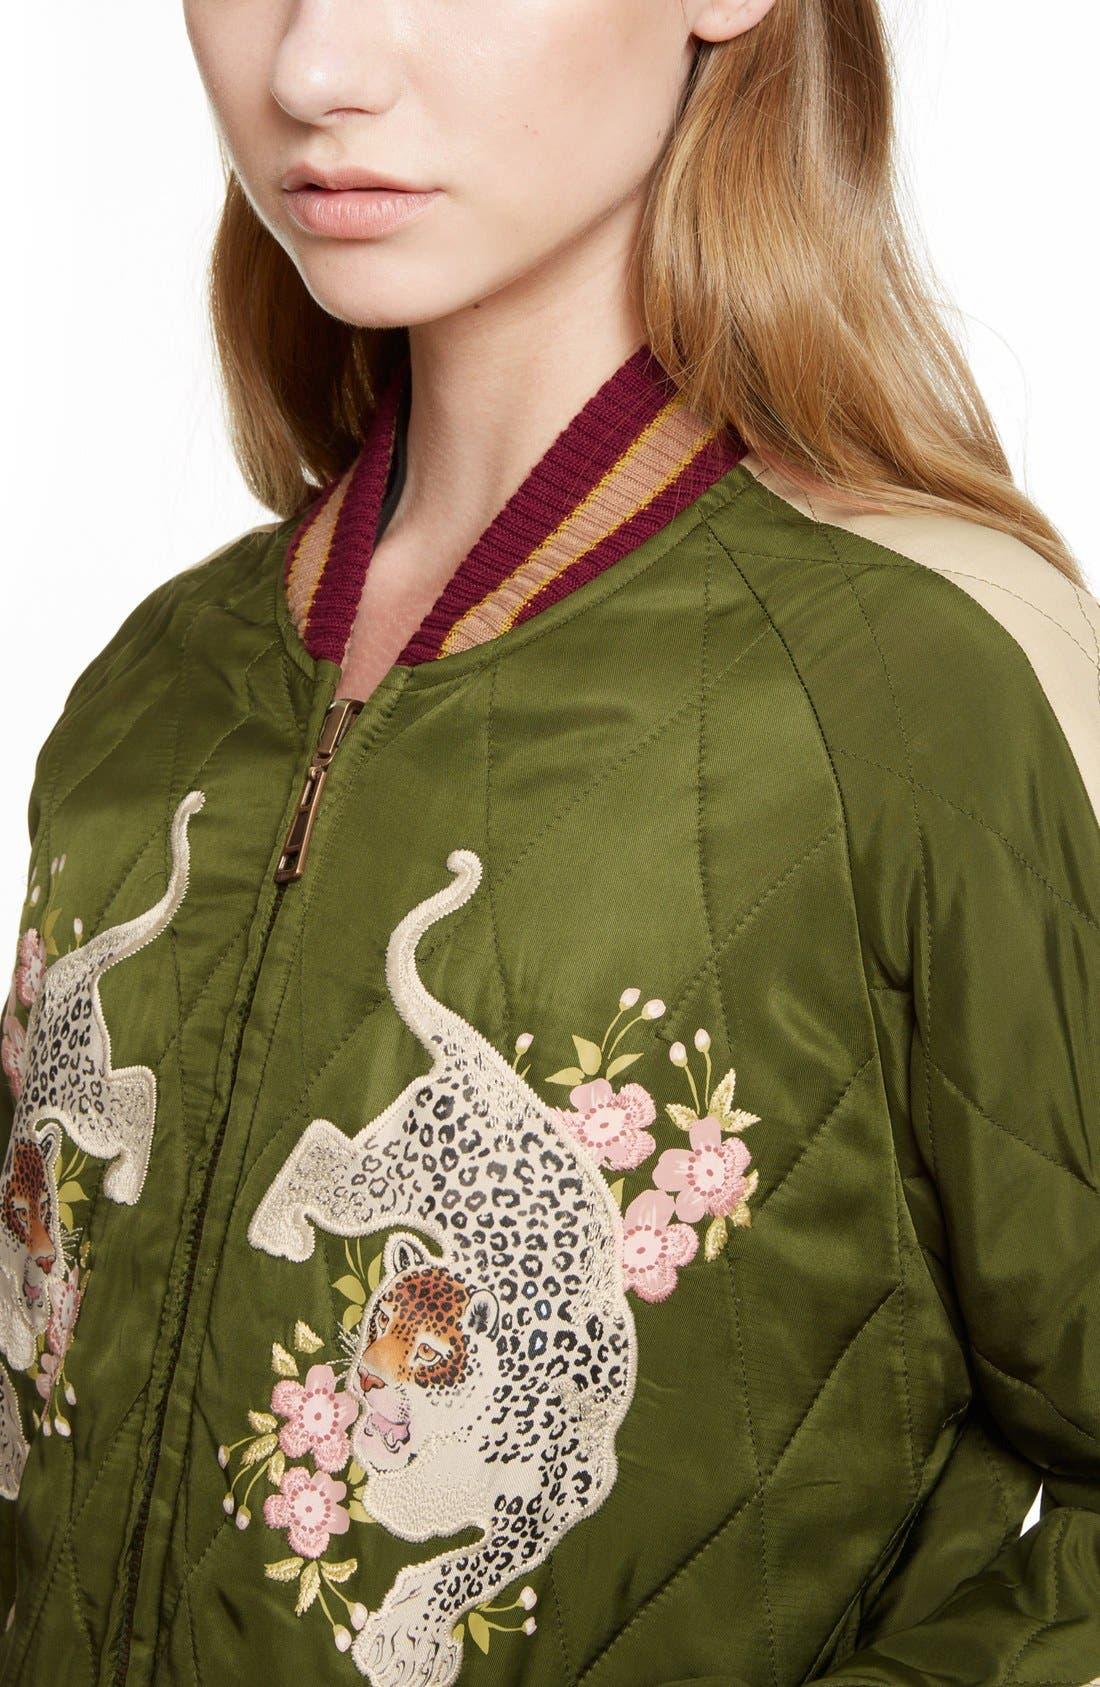 CHLOÉ, Reversible Embroidered Tech Satin Bomber Jacket, Alternate thumbnail 4, color, 301